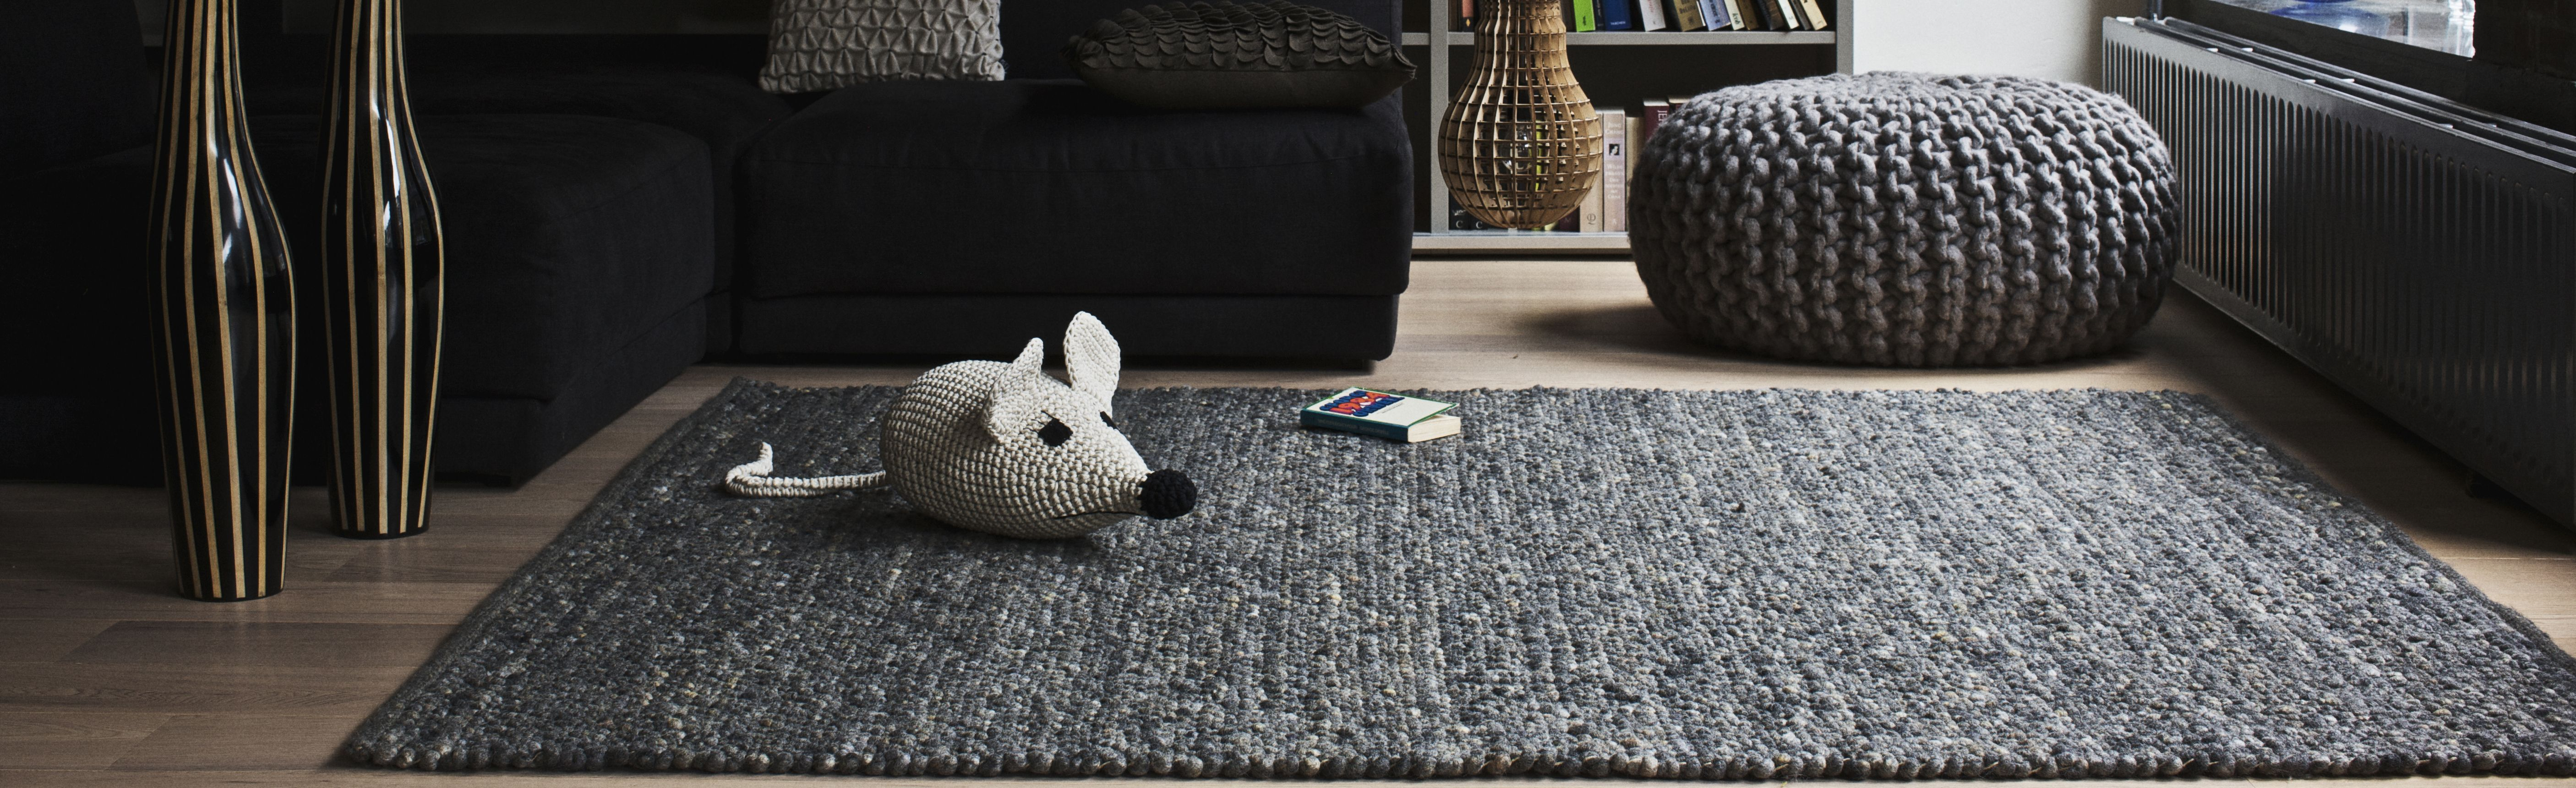 Pebbles 038 Vloerkleed Carpet Rug Teppich Interieur Interior